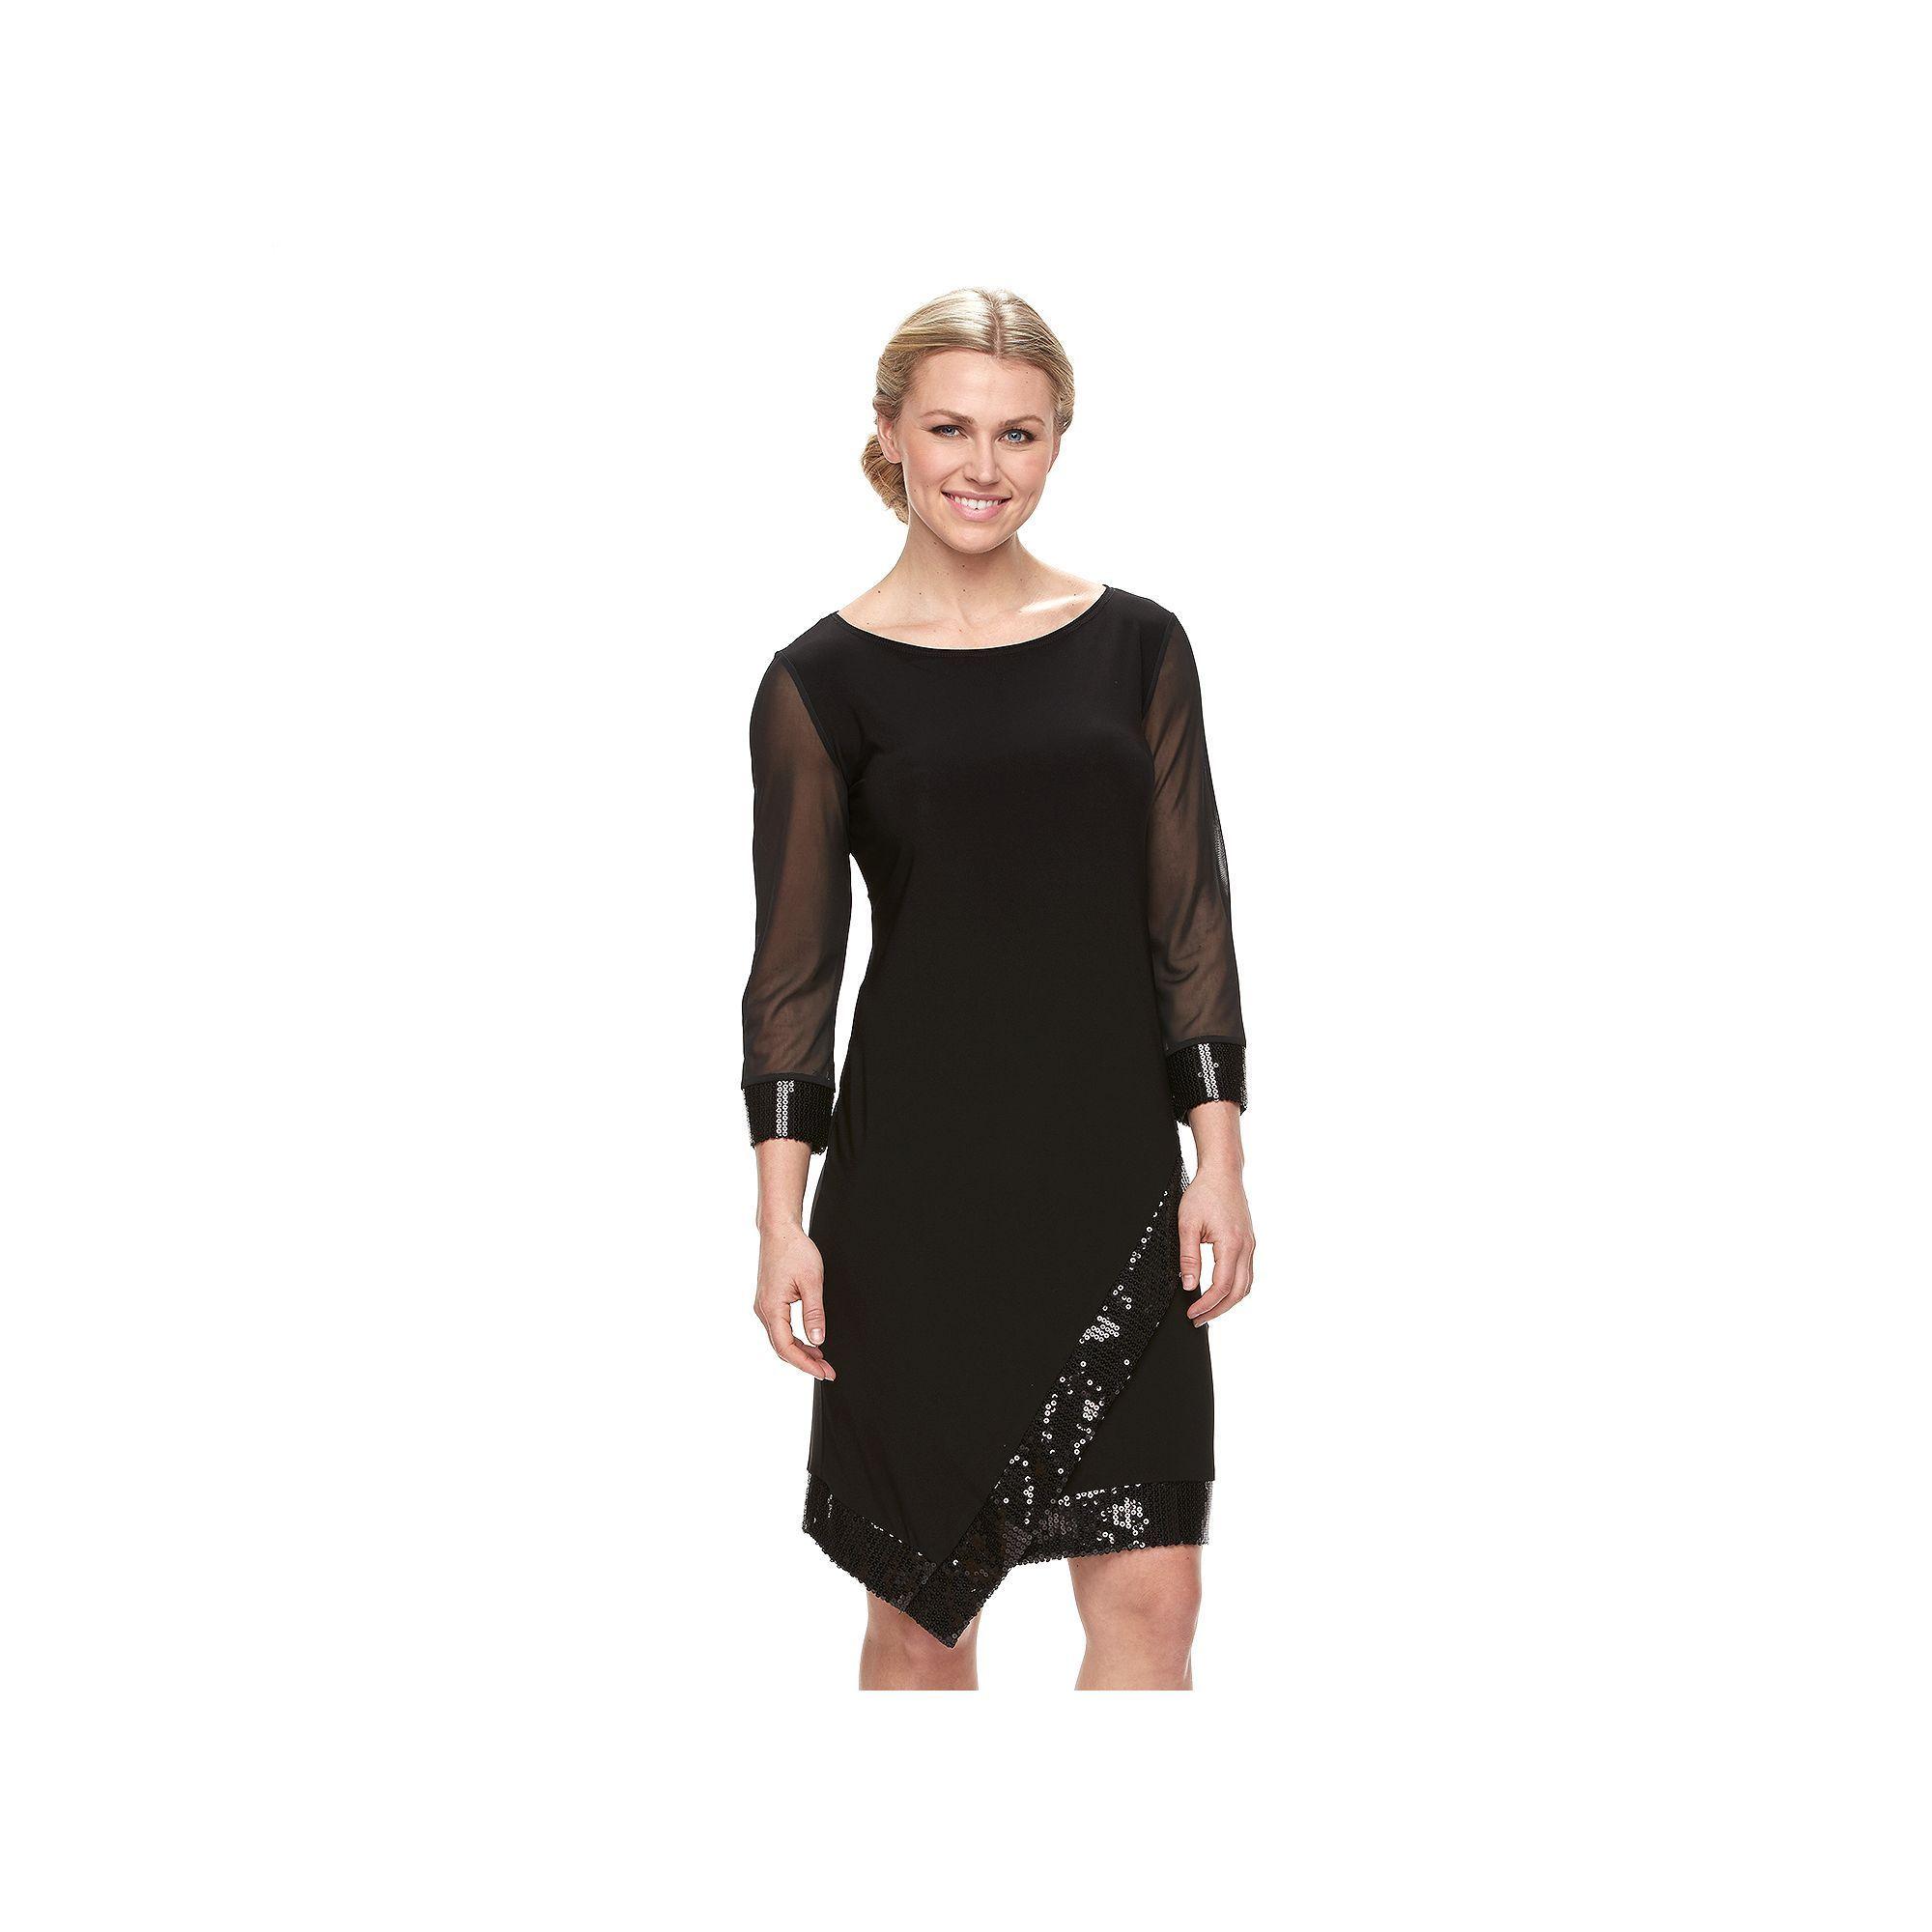 Womenus tiana b asymmetrical sequin shift dress size black